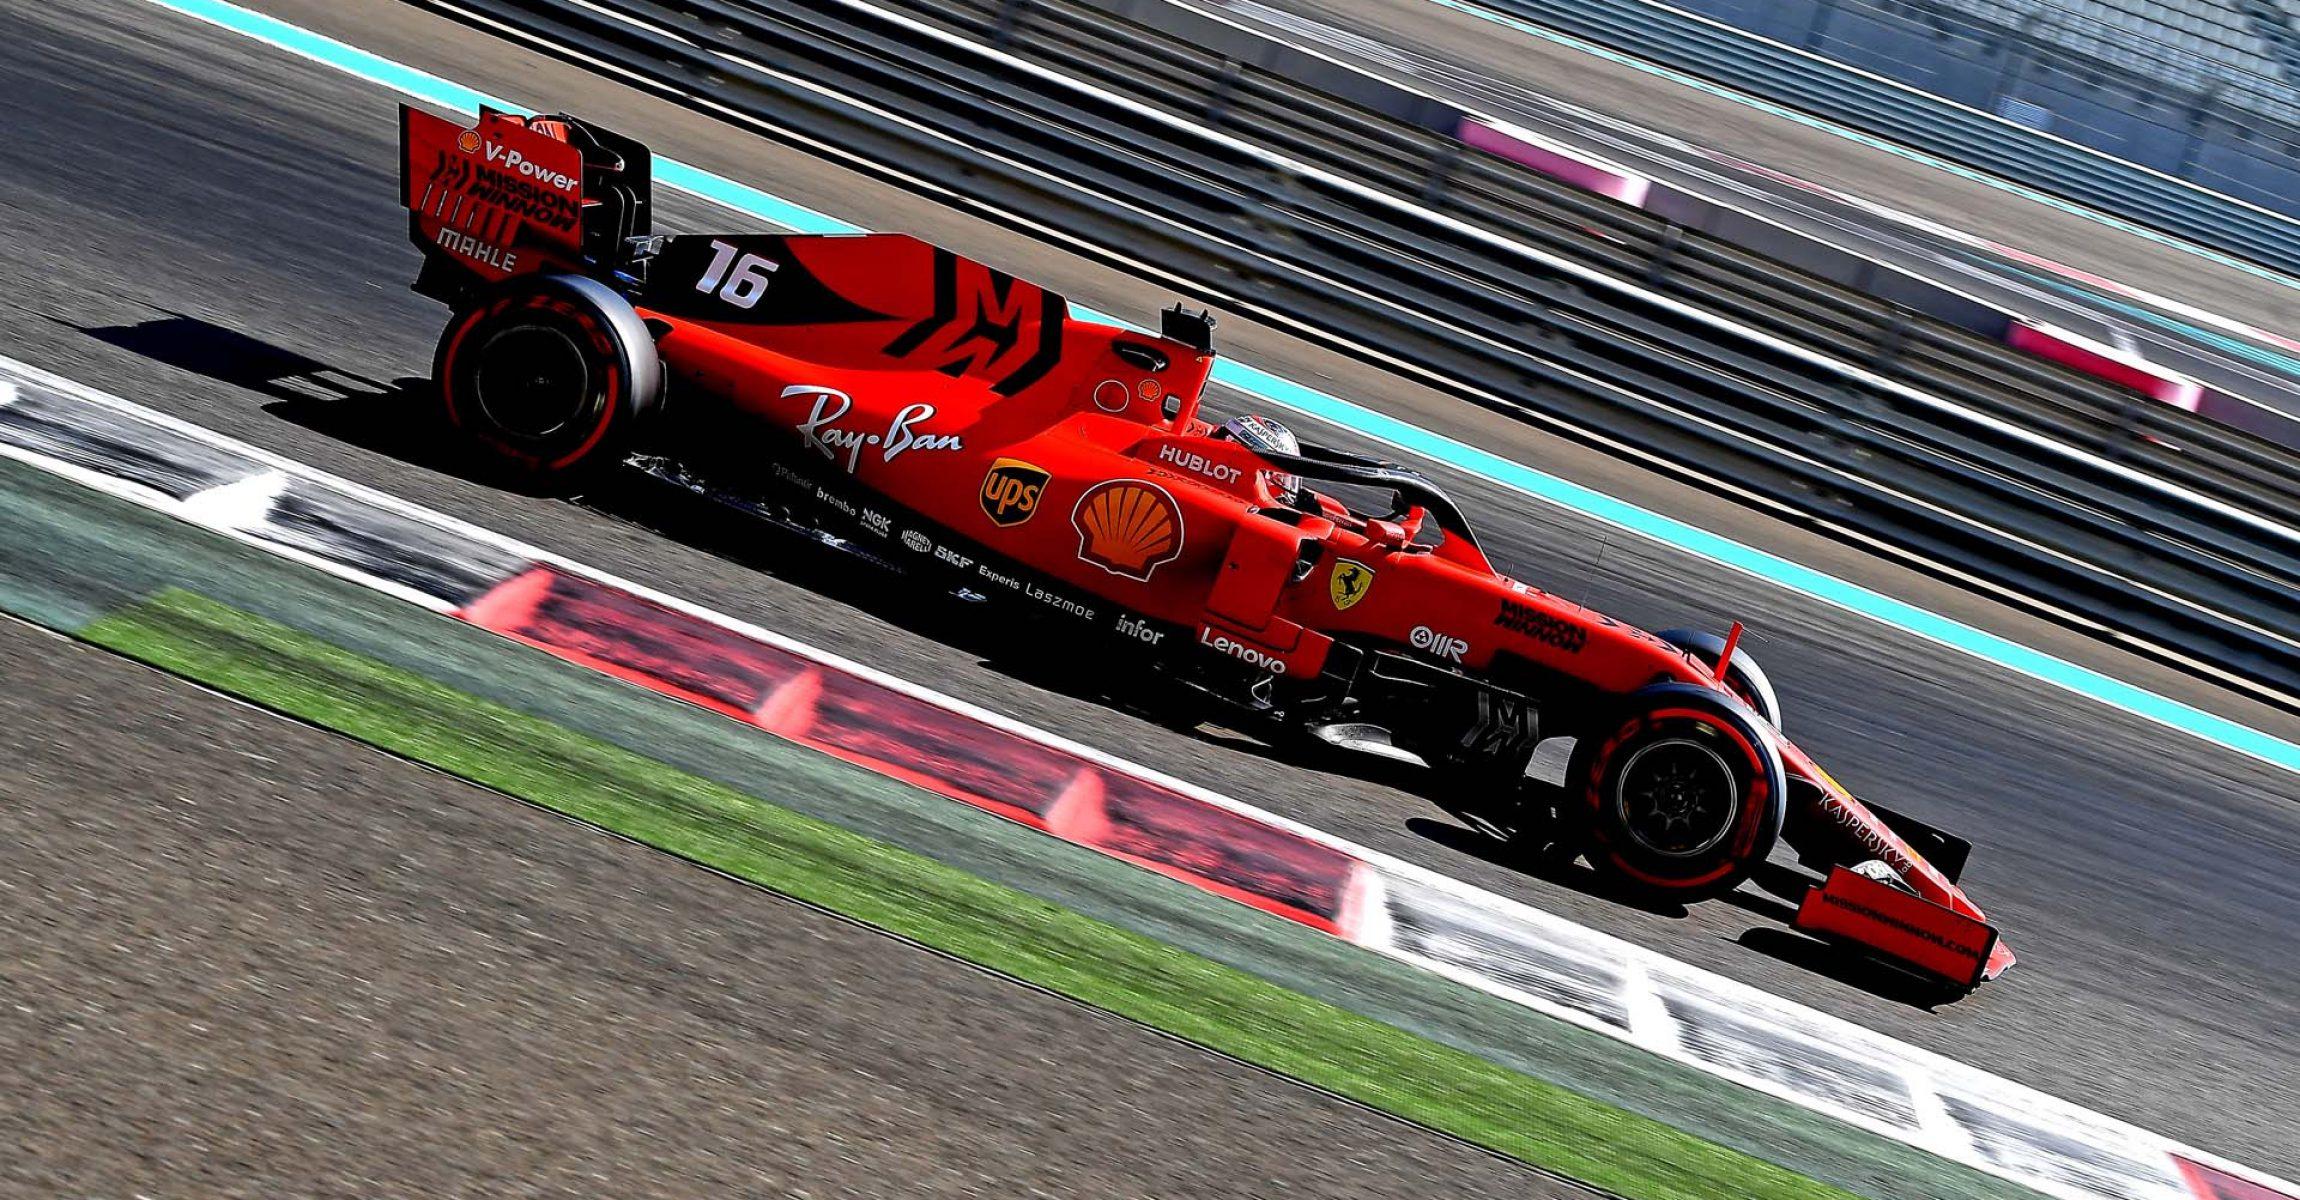 TEST T5 ABU DHABI 2019 - MERCOLEDÌ 04/12/2019 credit: @Scuderia Ferrari Press Office Charles Leclerc